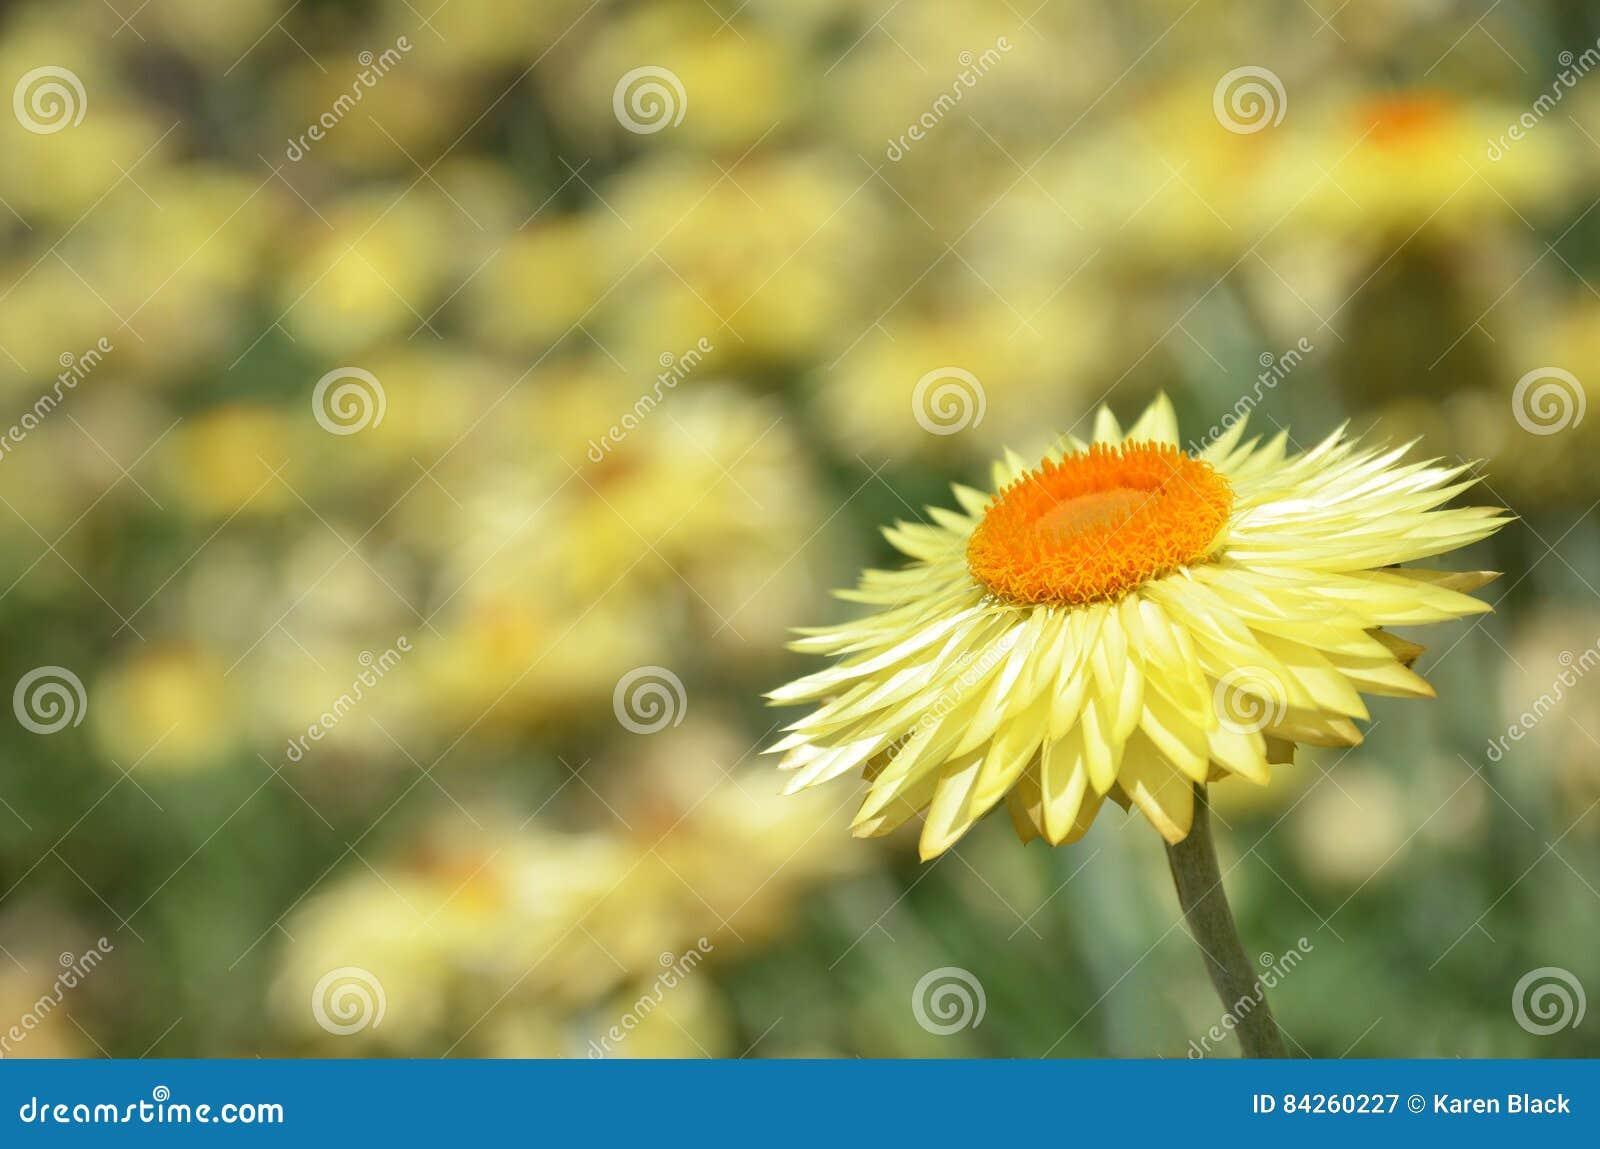 Australian Yellow Paper Daisy Flower Stock Image Image Of Schoenia